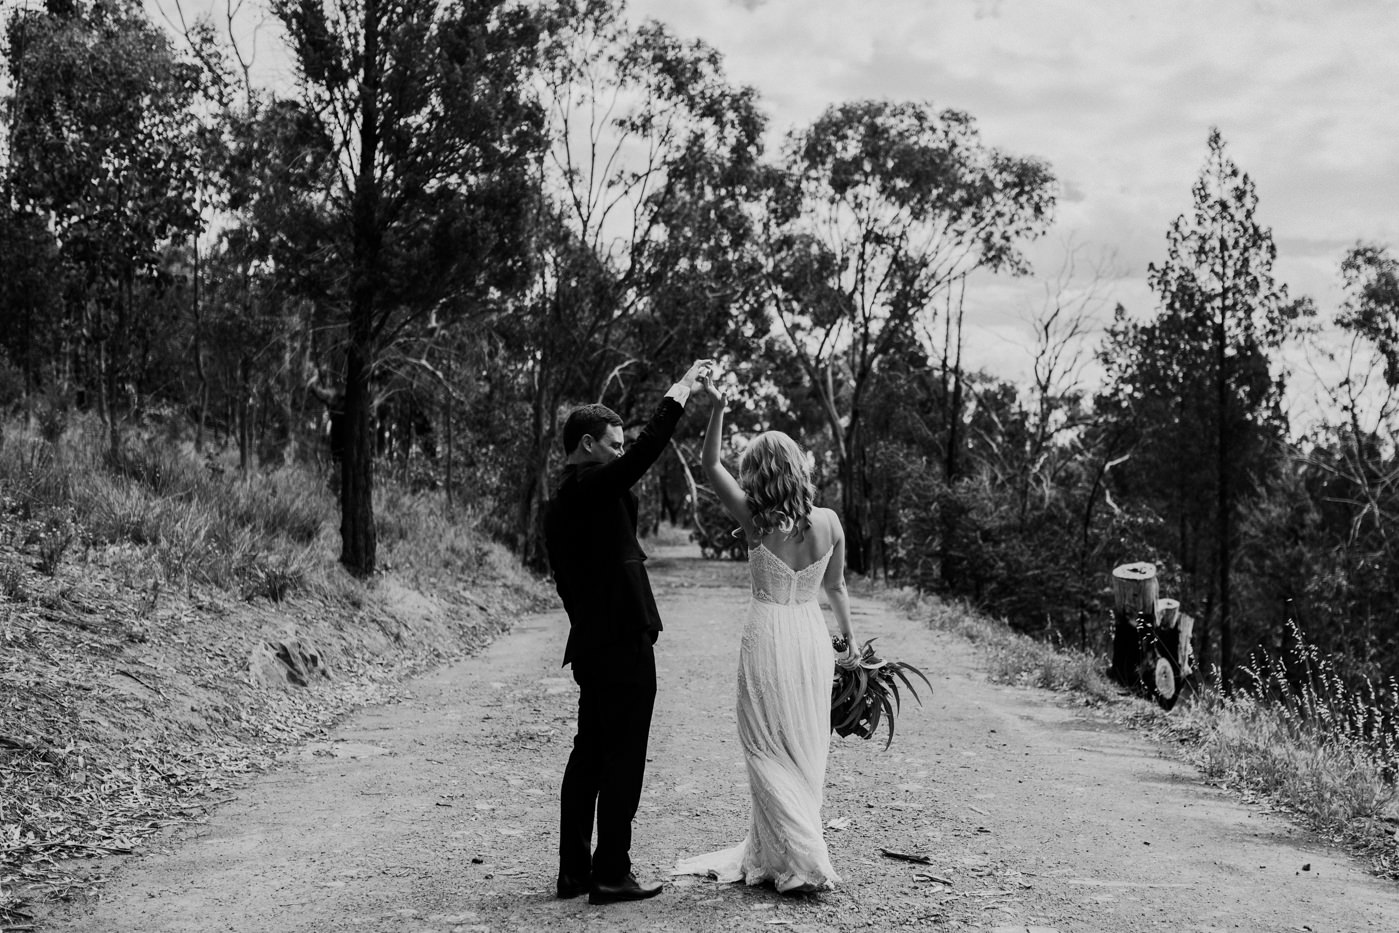 Anthony & Eliet - Wagga Wagga Wedding - Country NSW - Samantha Heather Photography-55.jpg